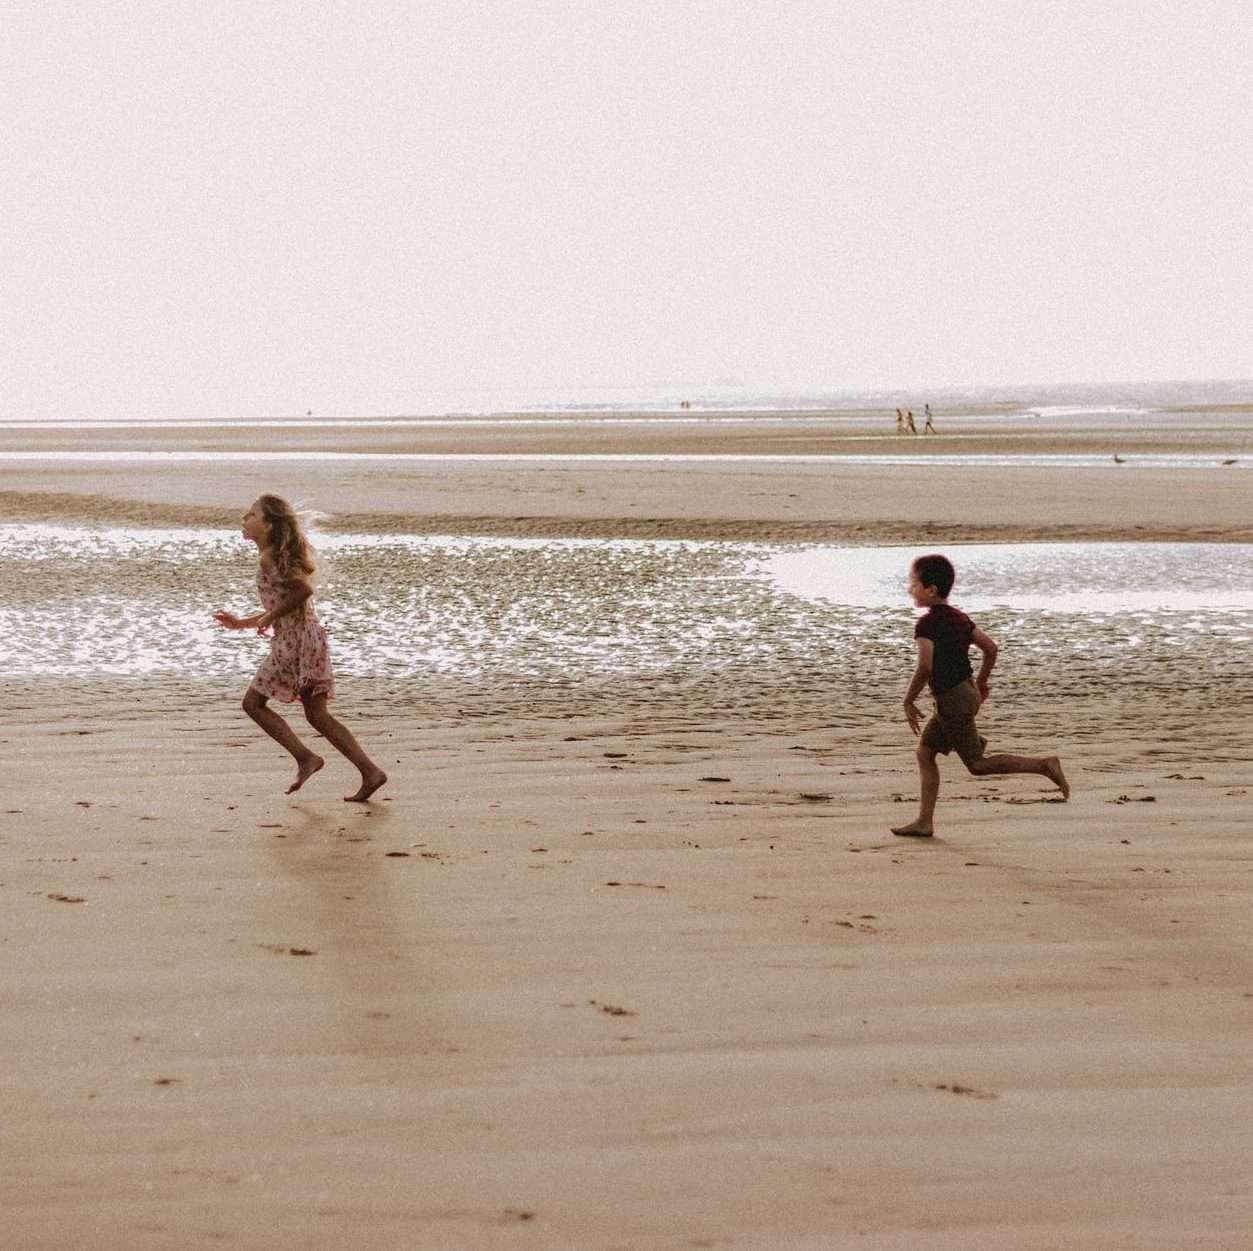 kids running on sandy beach